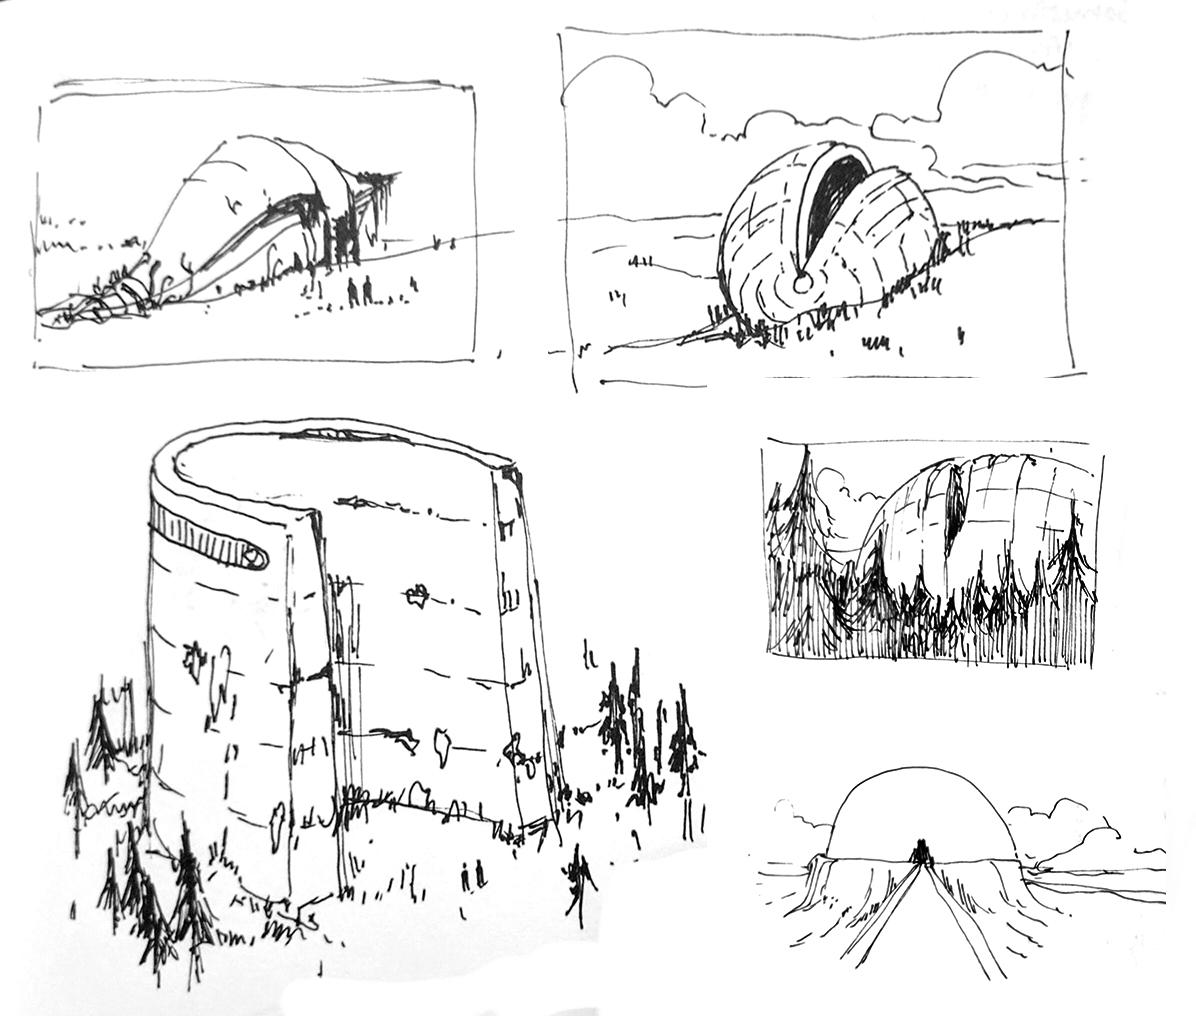 ruins-sketches.png